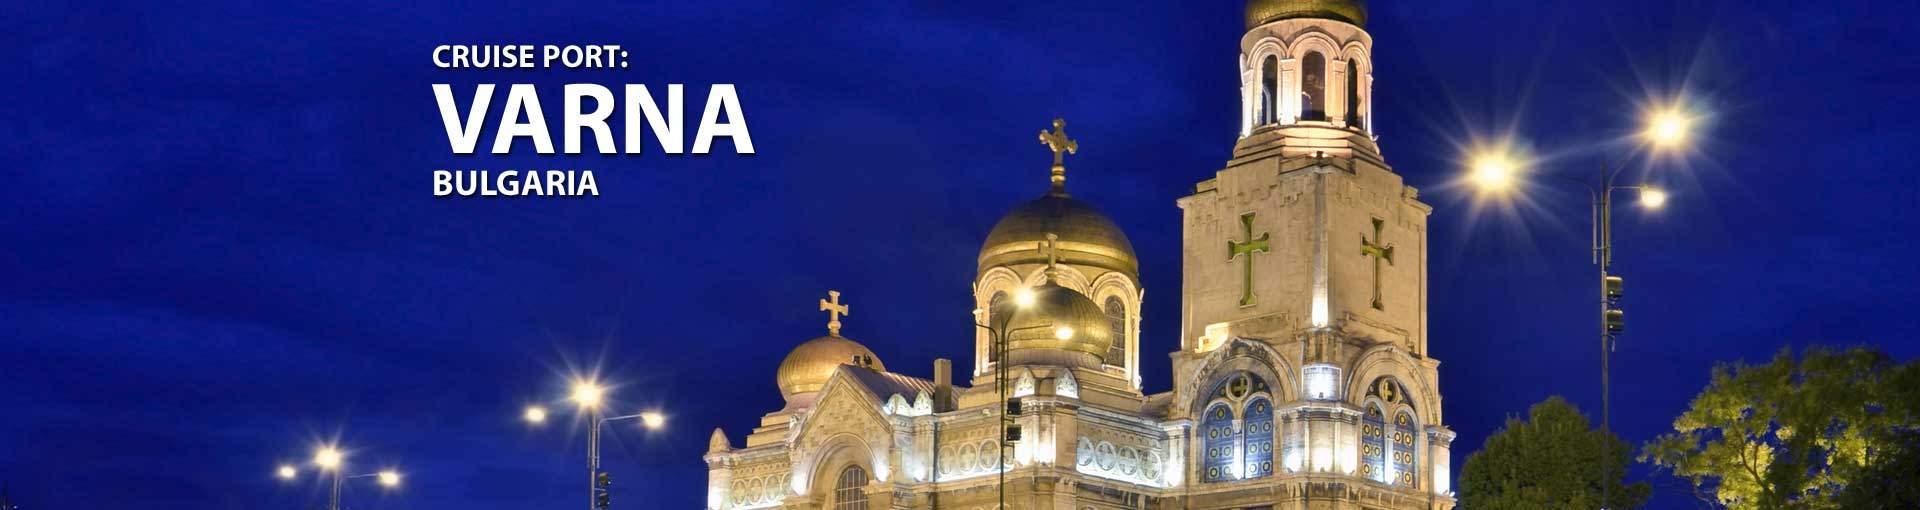 Cruises to Varna, Bulgaria